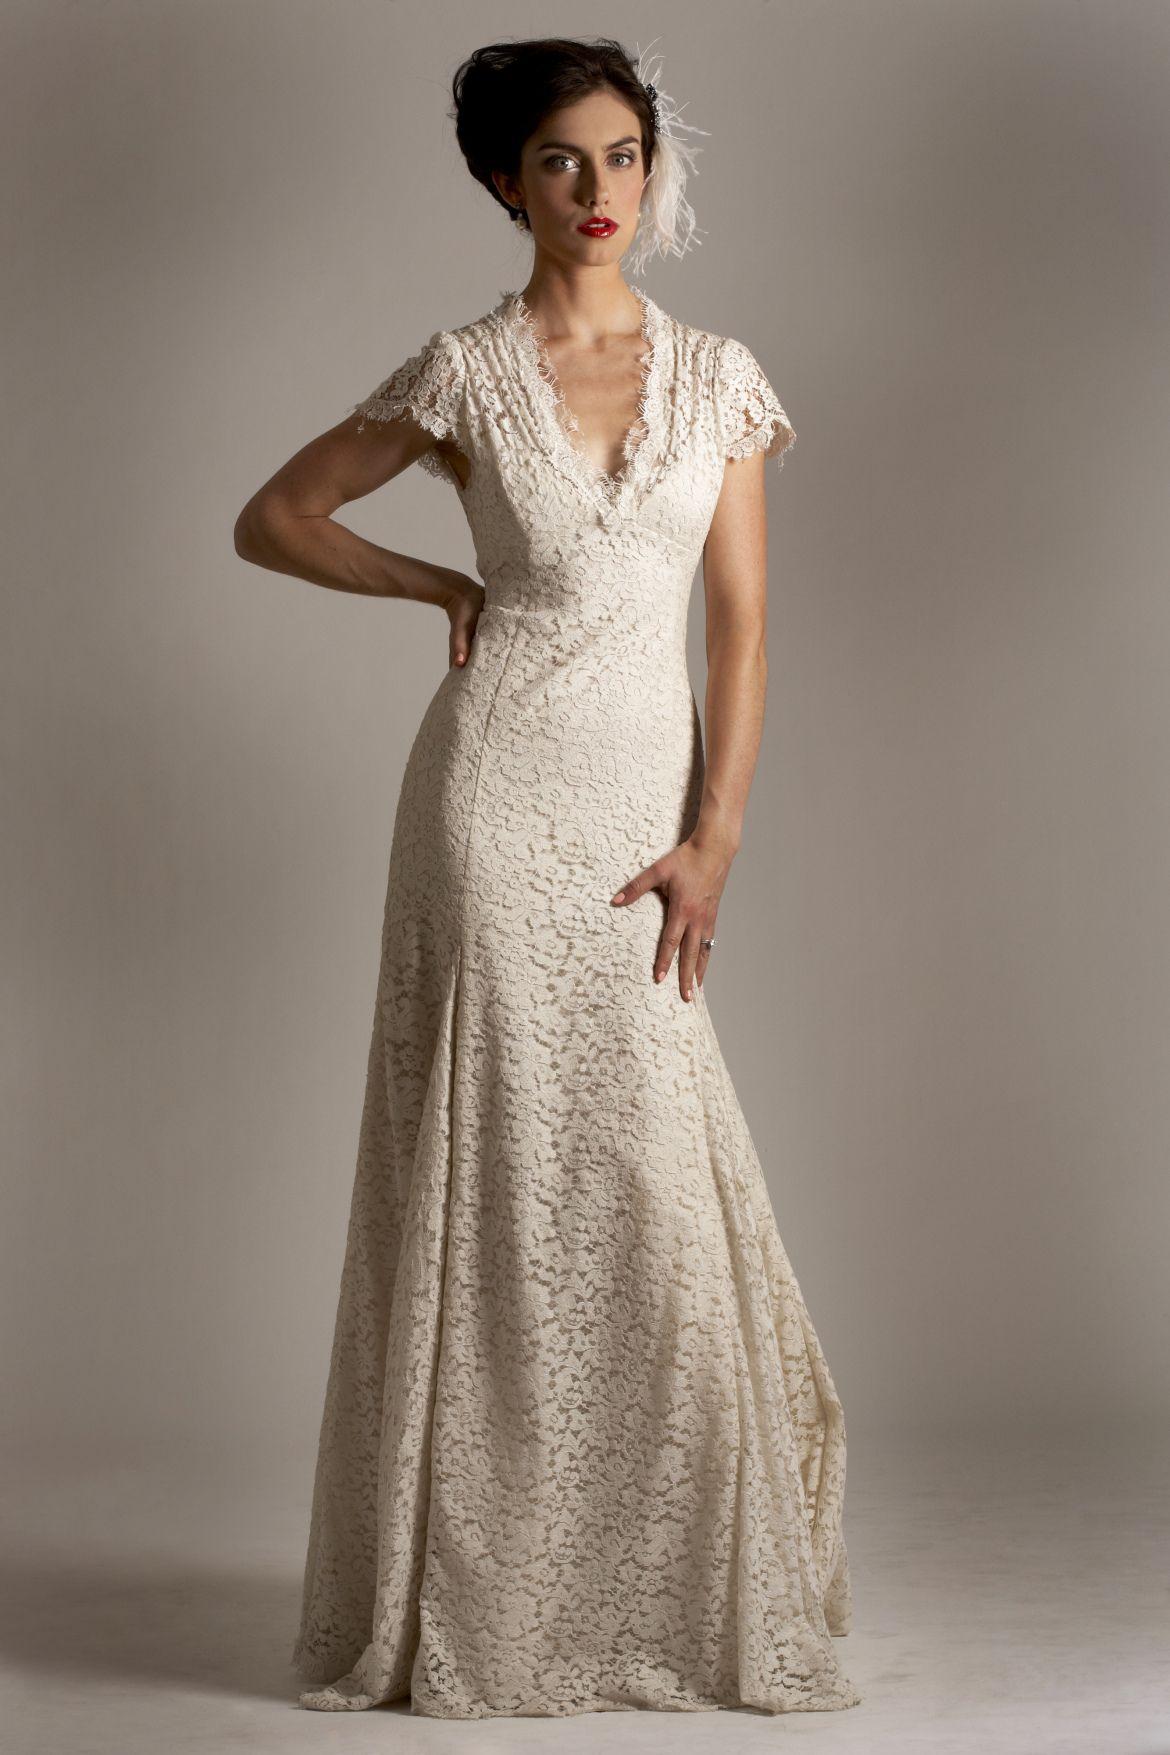 2019 Wedding Dress For Older Brides Women's Dresses Weddings Check More At: Informal Second Wedding Dresses Simple At Websimilar.org